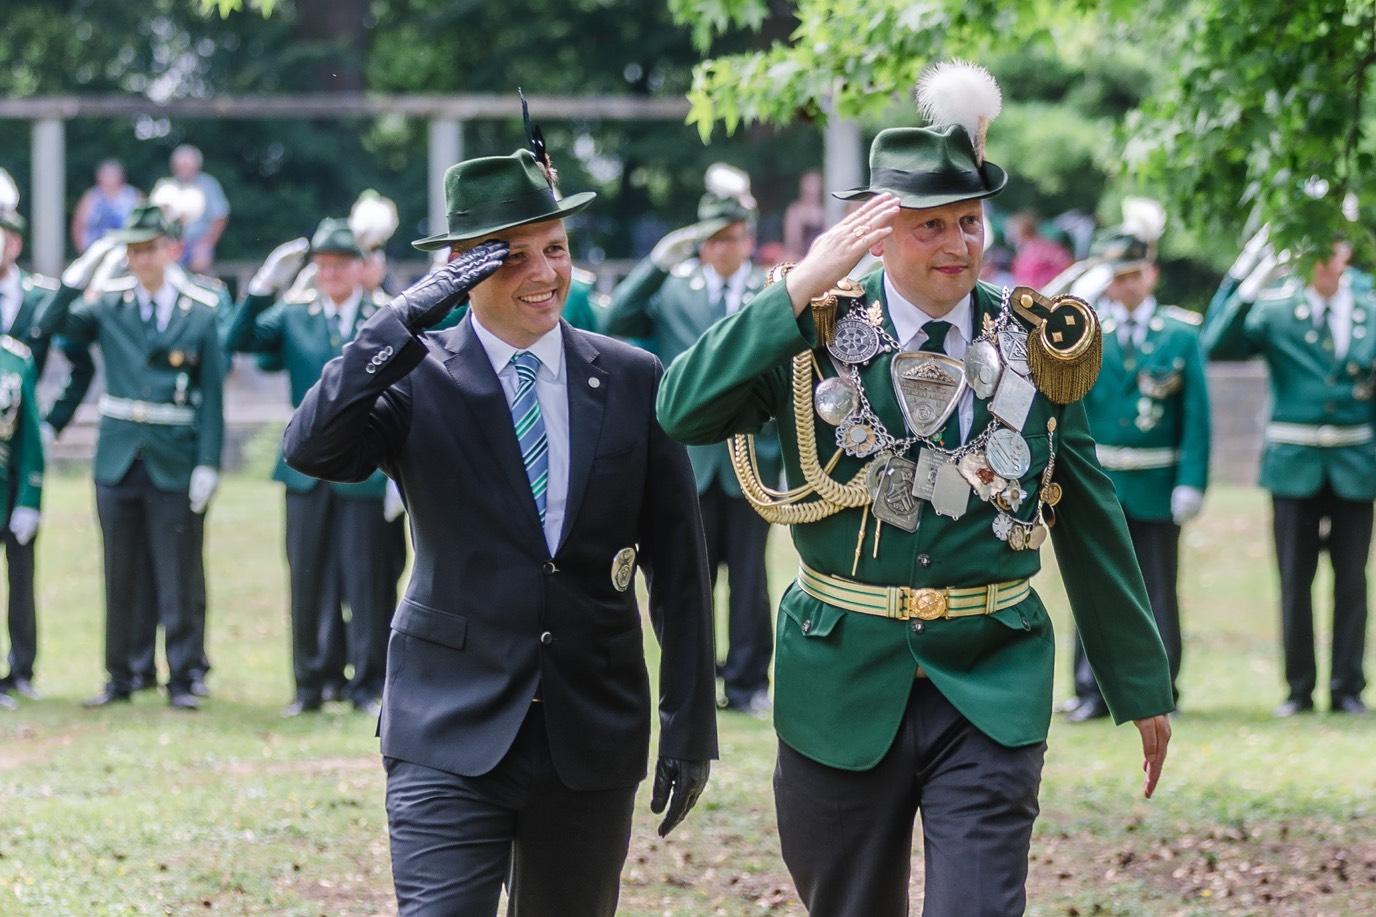 Bürgerschützen Ahlen, Abnahme des Bataillons 2018